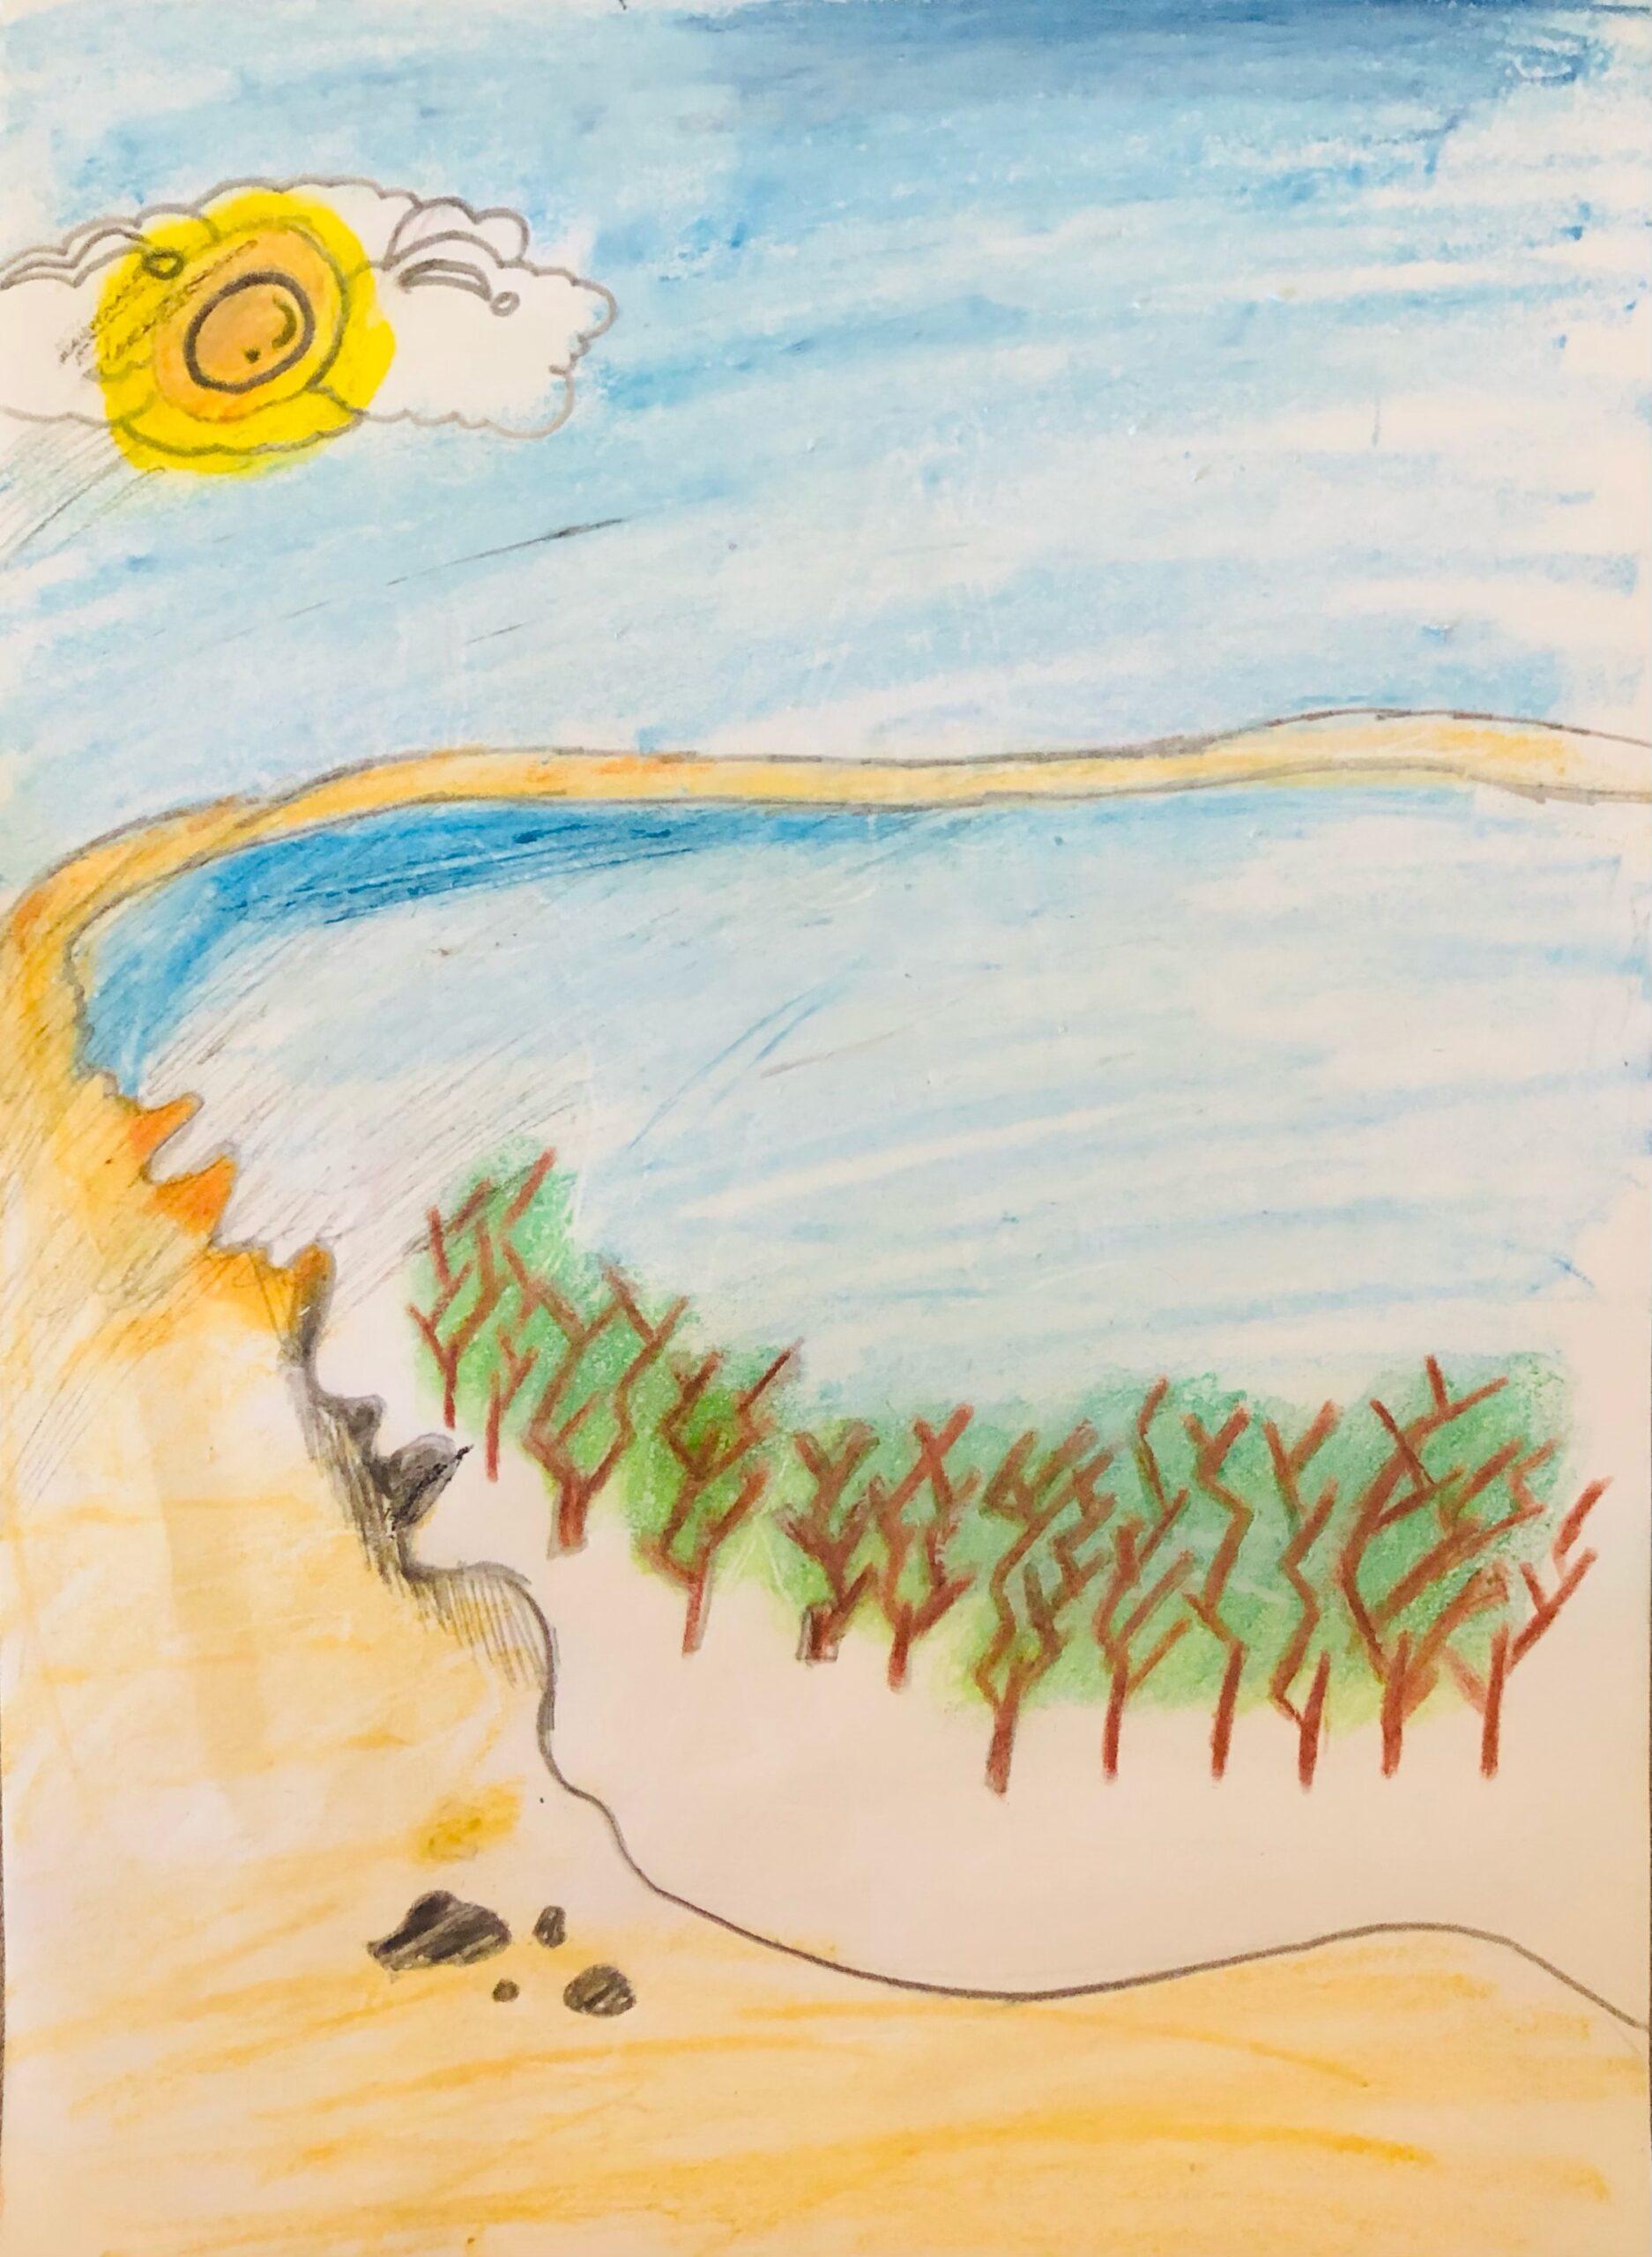 The Yas Island by Fathimathul Jaza